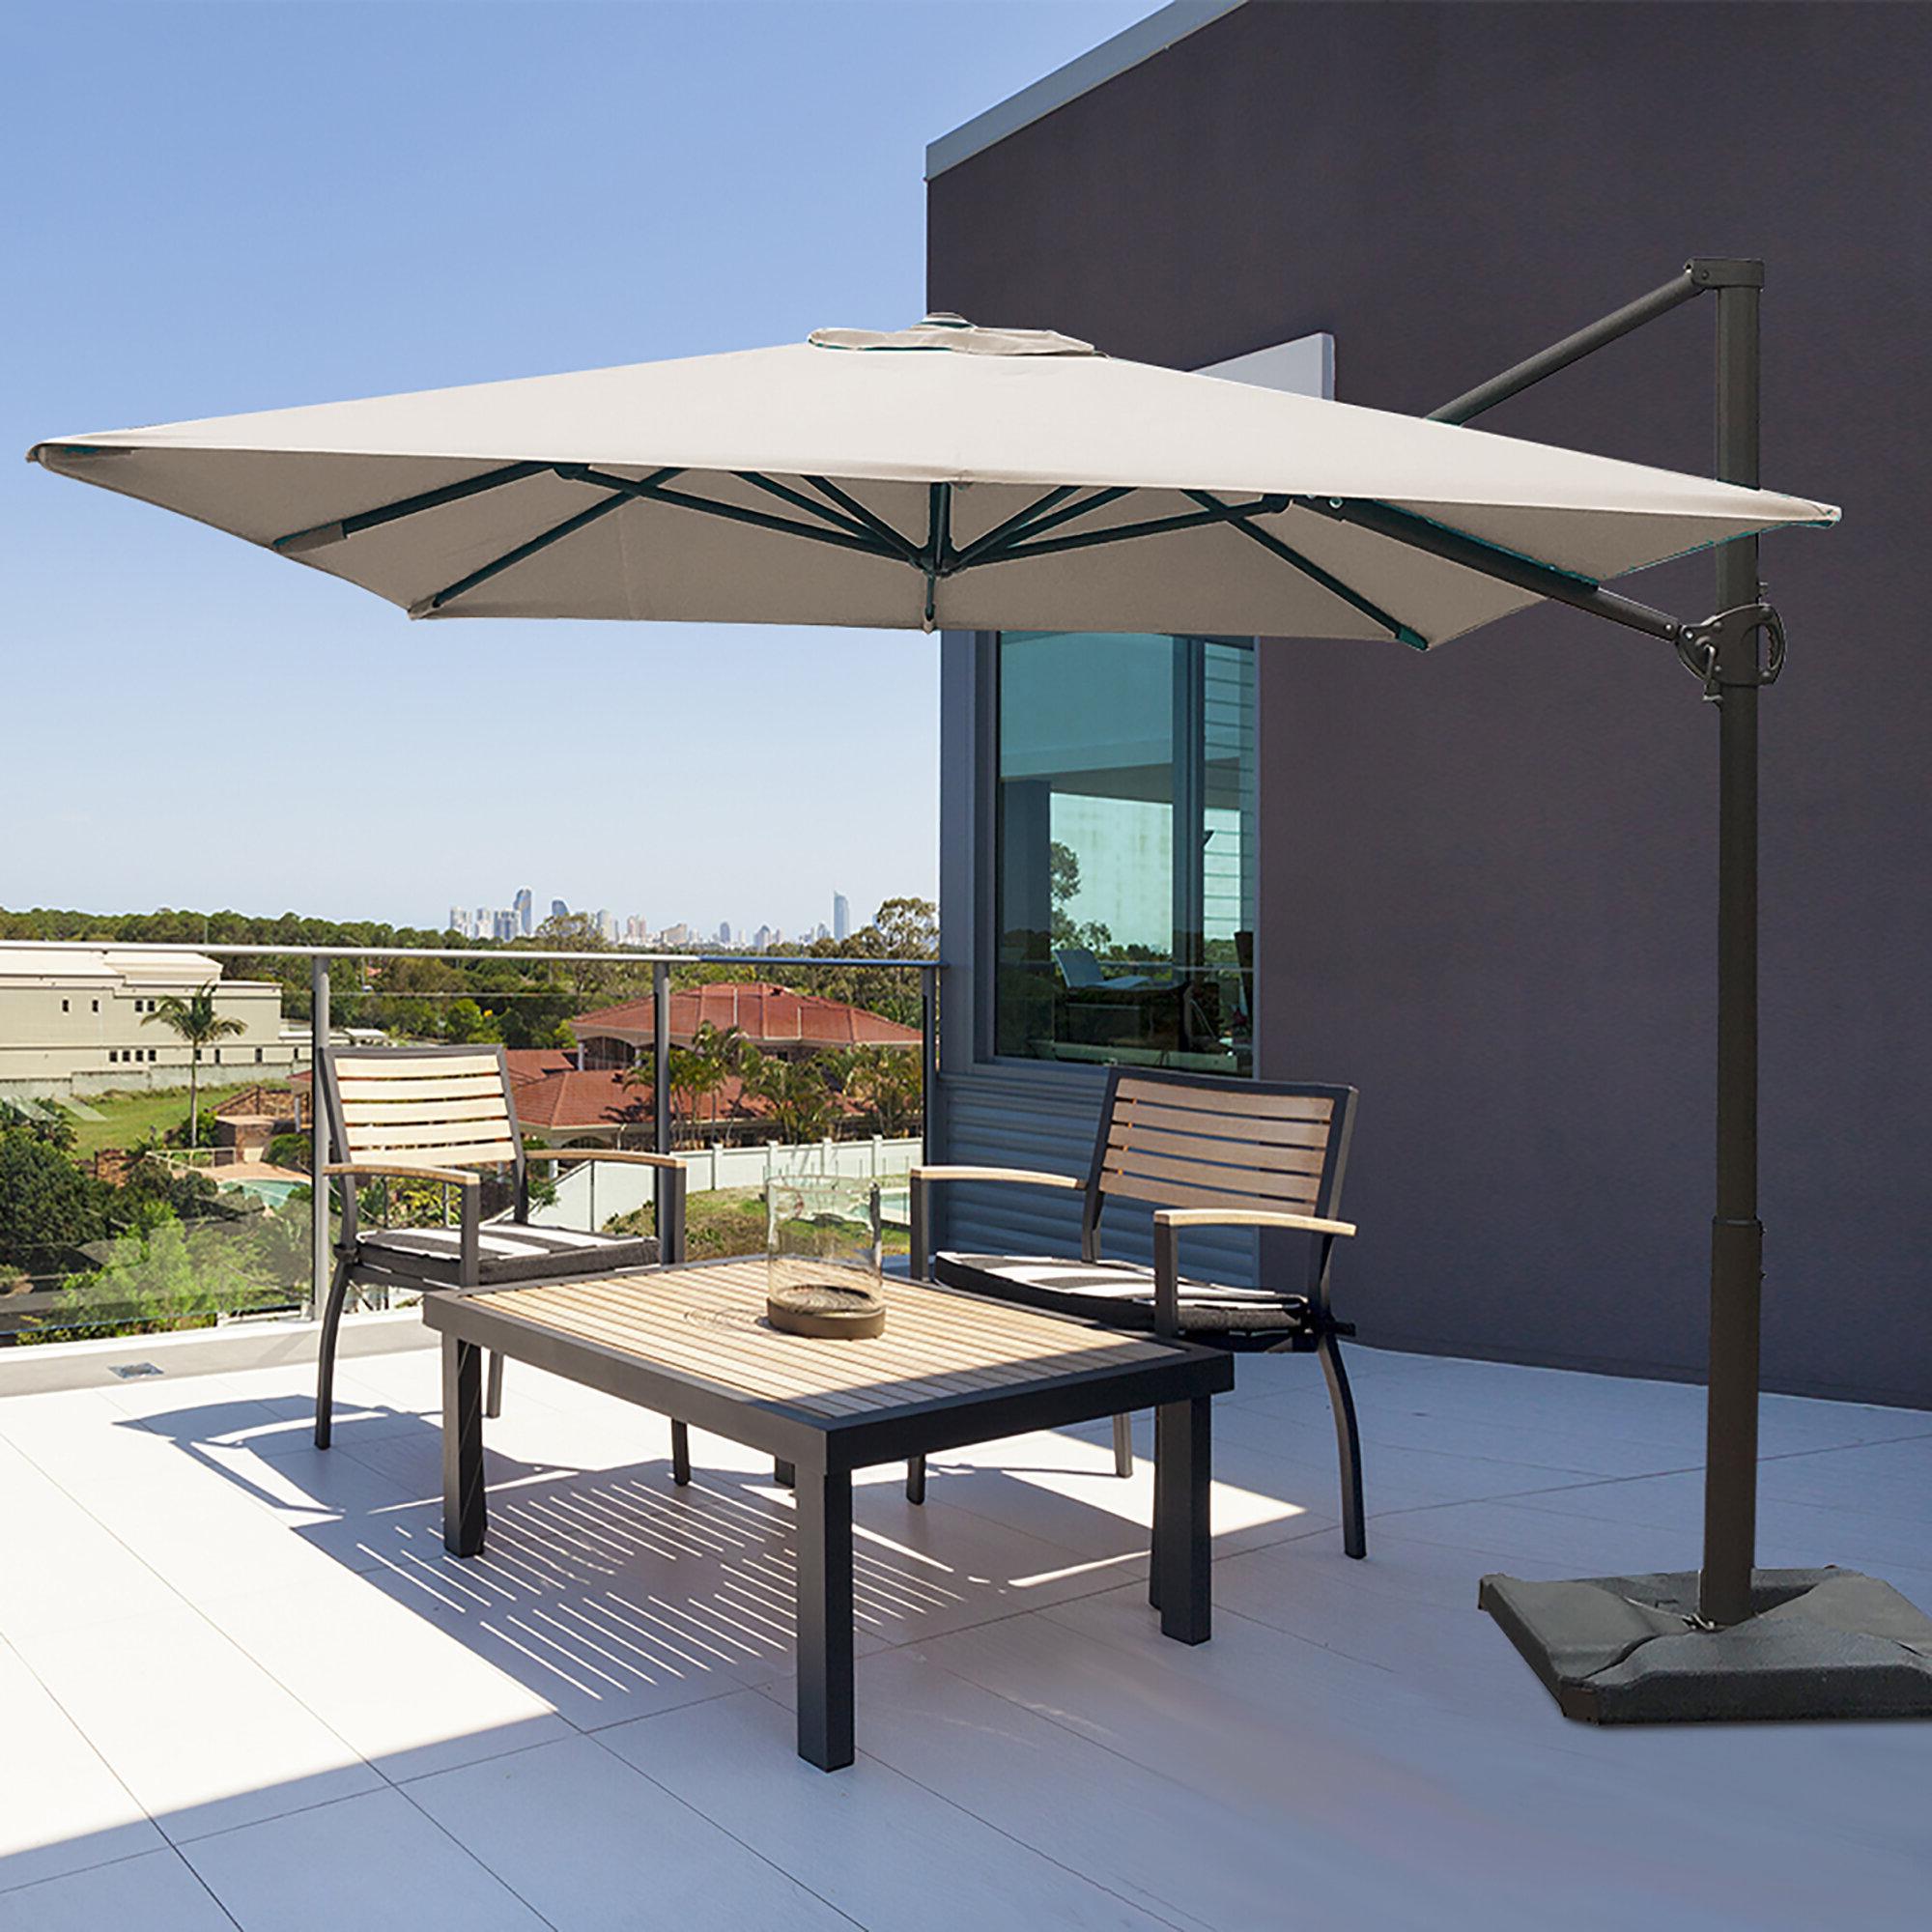 Fordwich 8' X 10' Rectangular Cantilever Umbrella With Recent Cantilever Umbrellas (View 5 of 20)